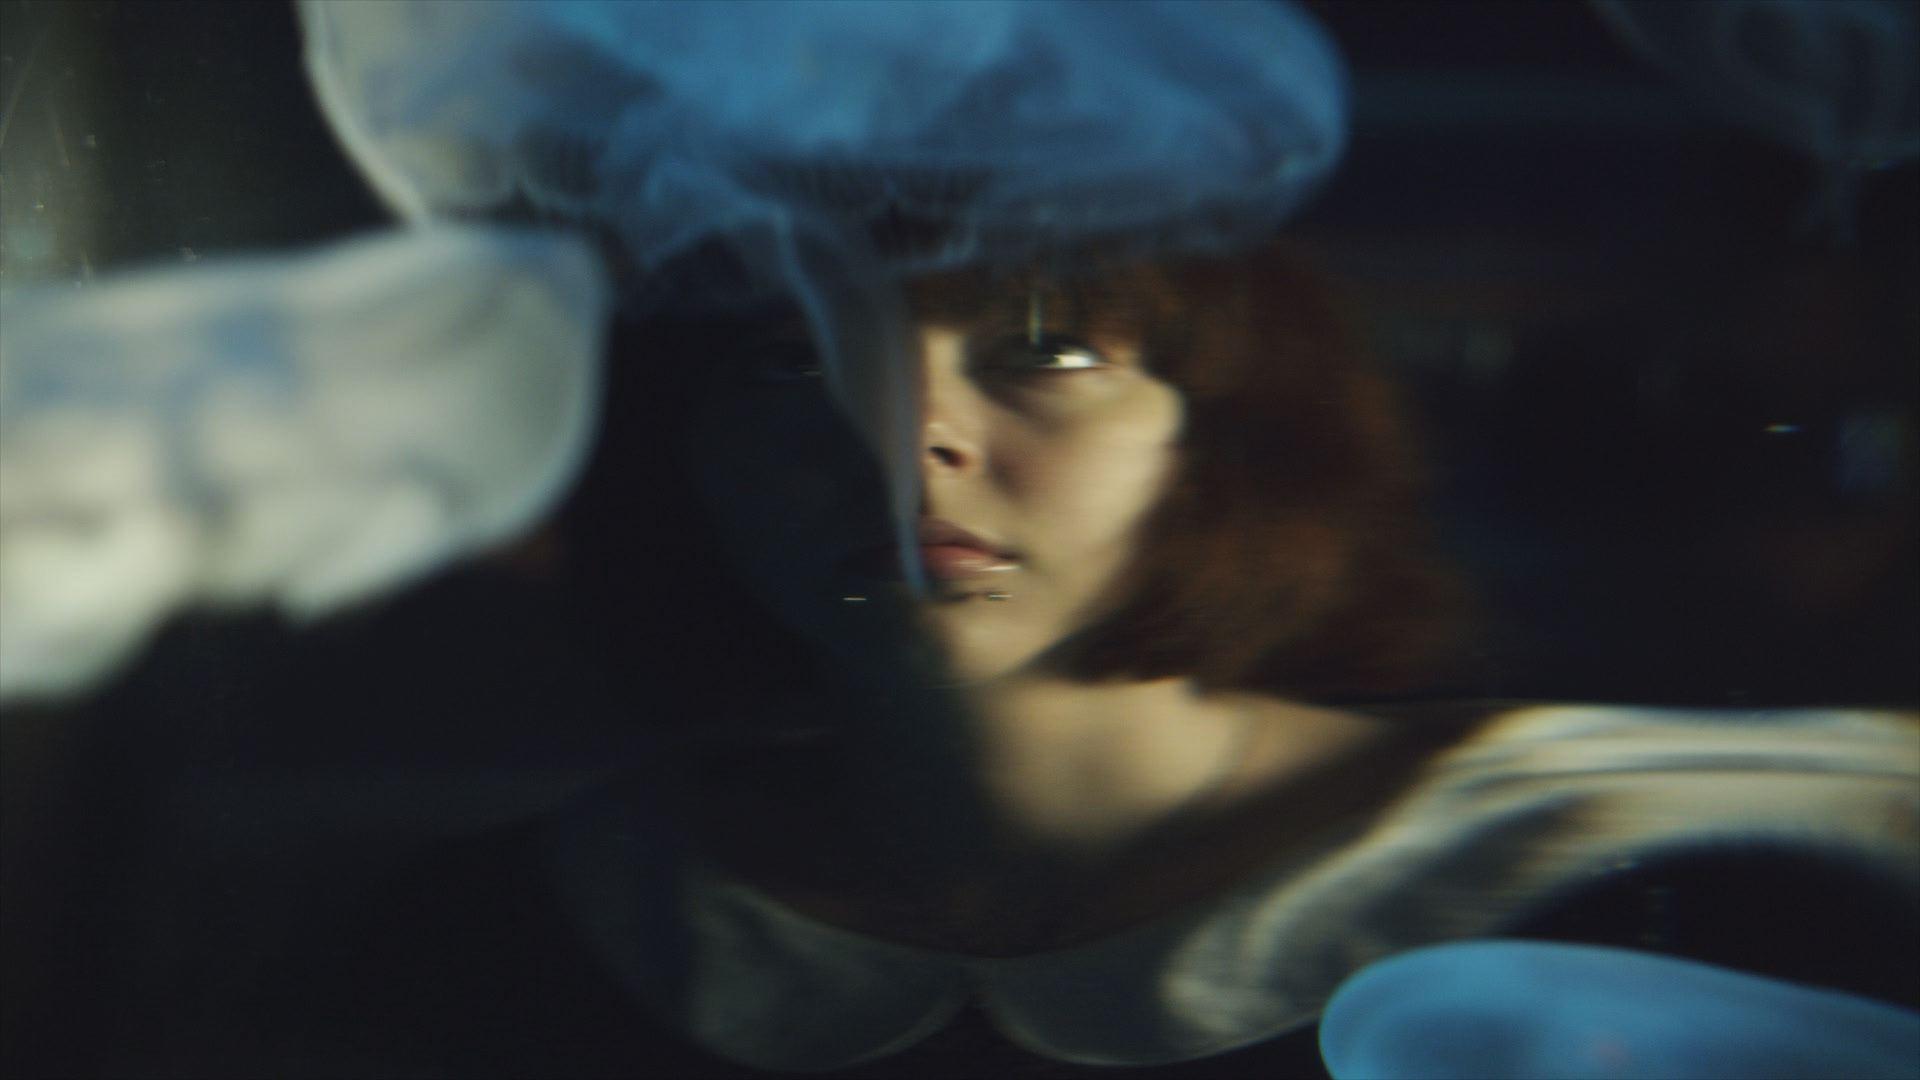 Becoming Me (Matka minuksi, 2014)